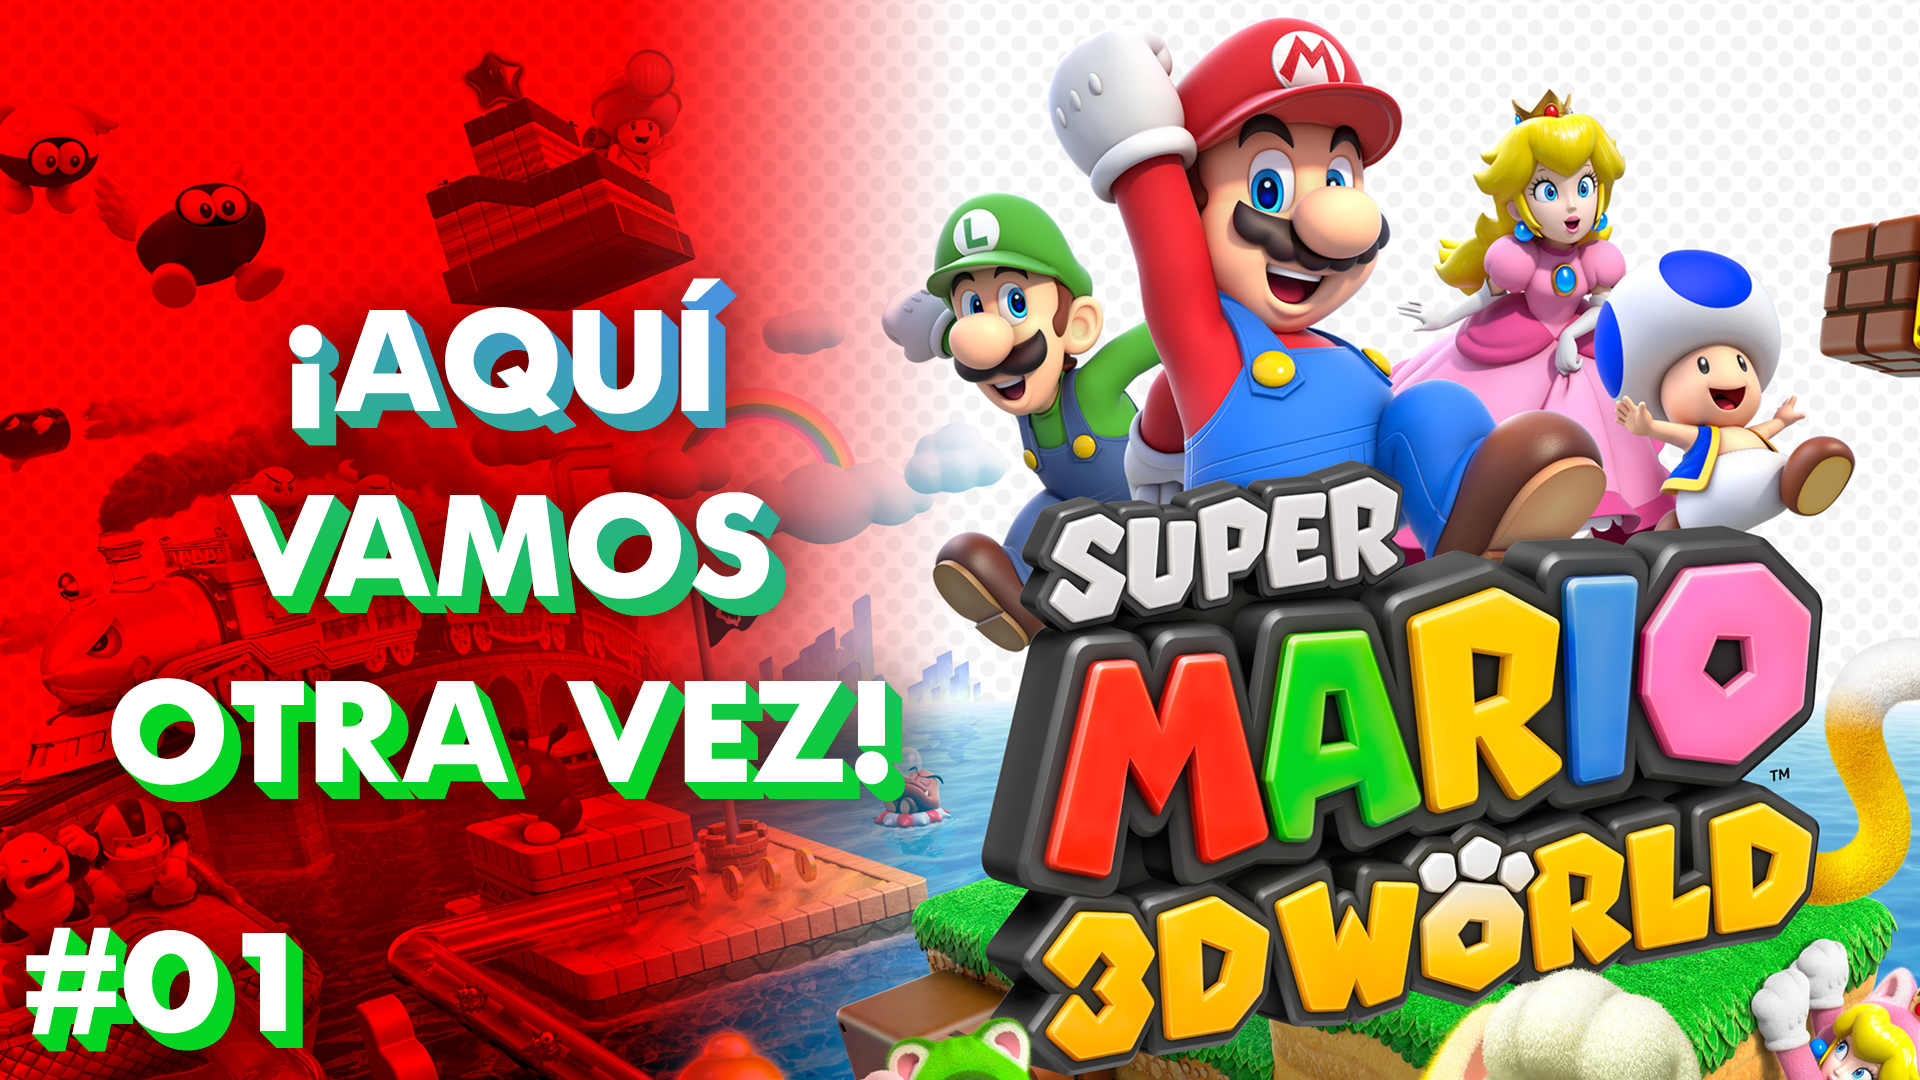 Super Mario 3D World #01- ¡Aquí vamos otra vez!